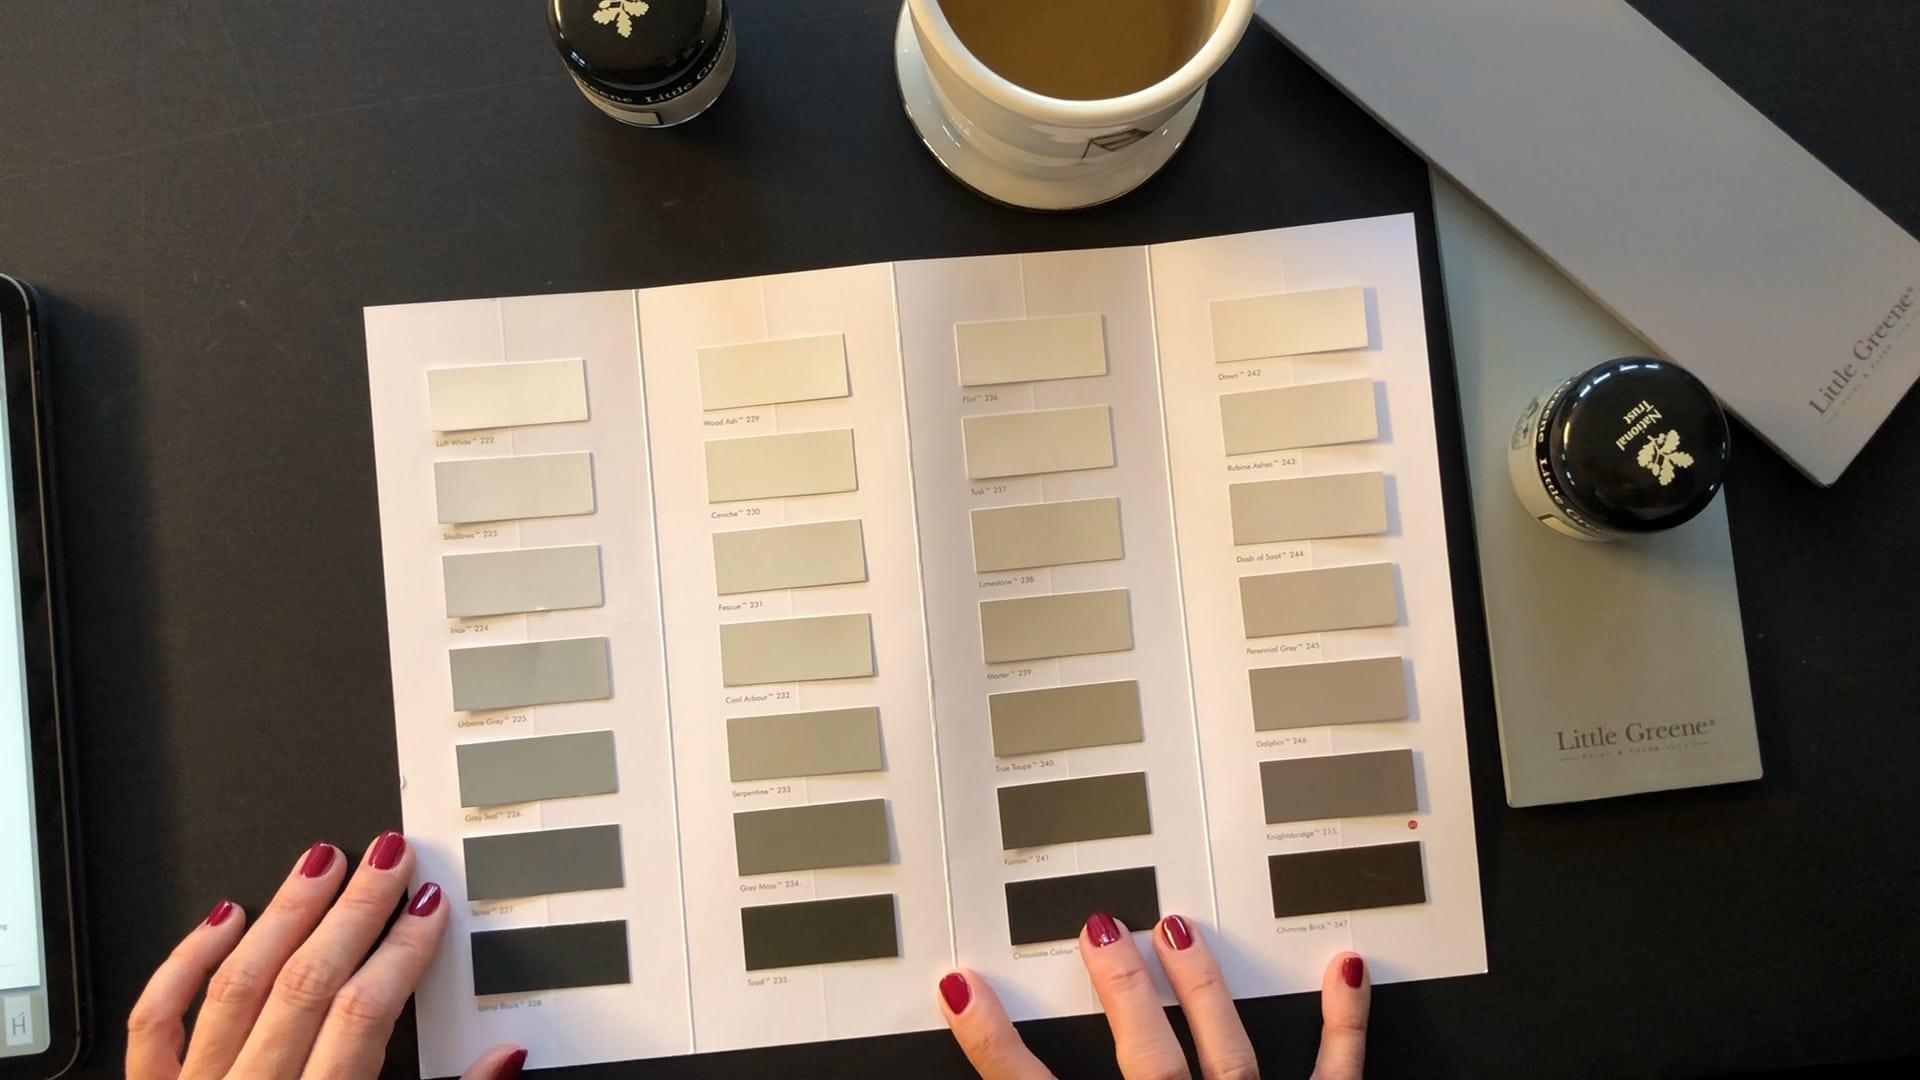 Welche Wandfarbe? Farbenlehre kalte und warme Farben warmes Grau kaltes Grau Taupe